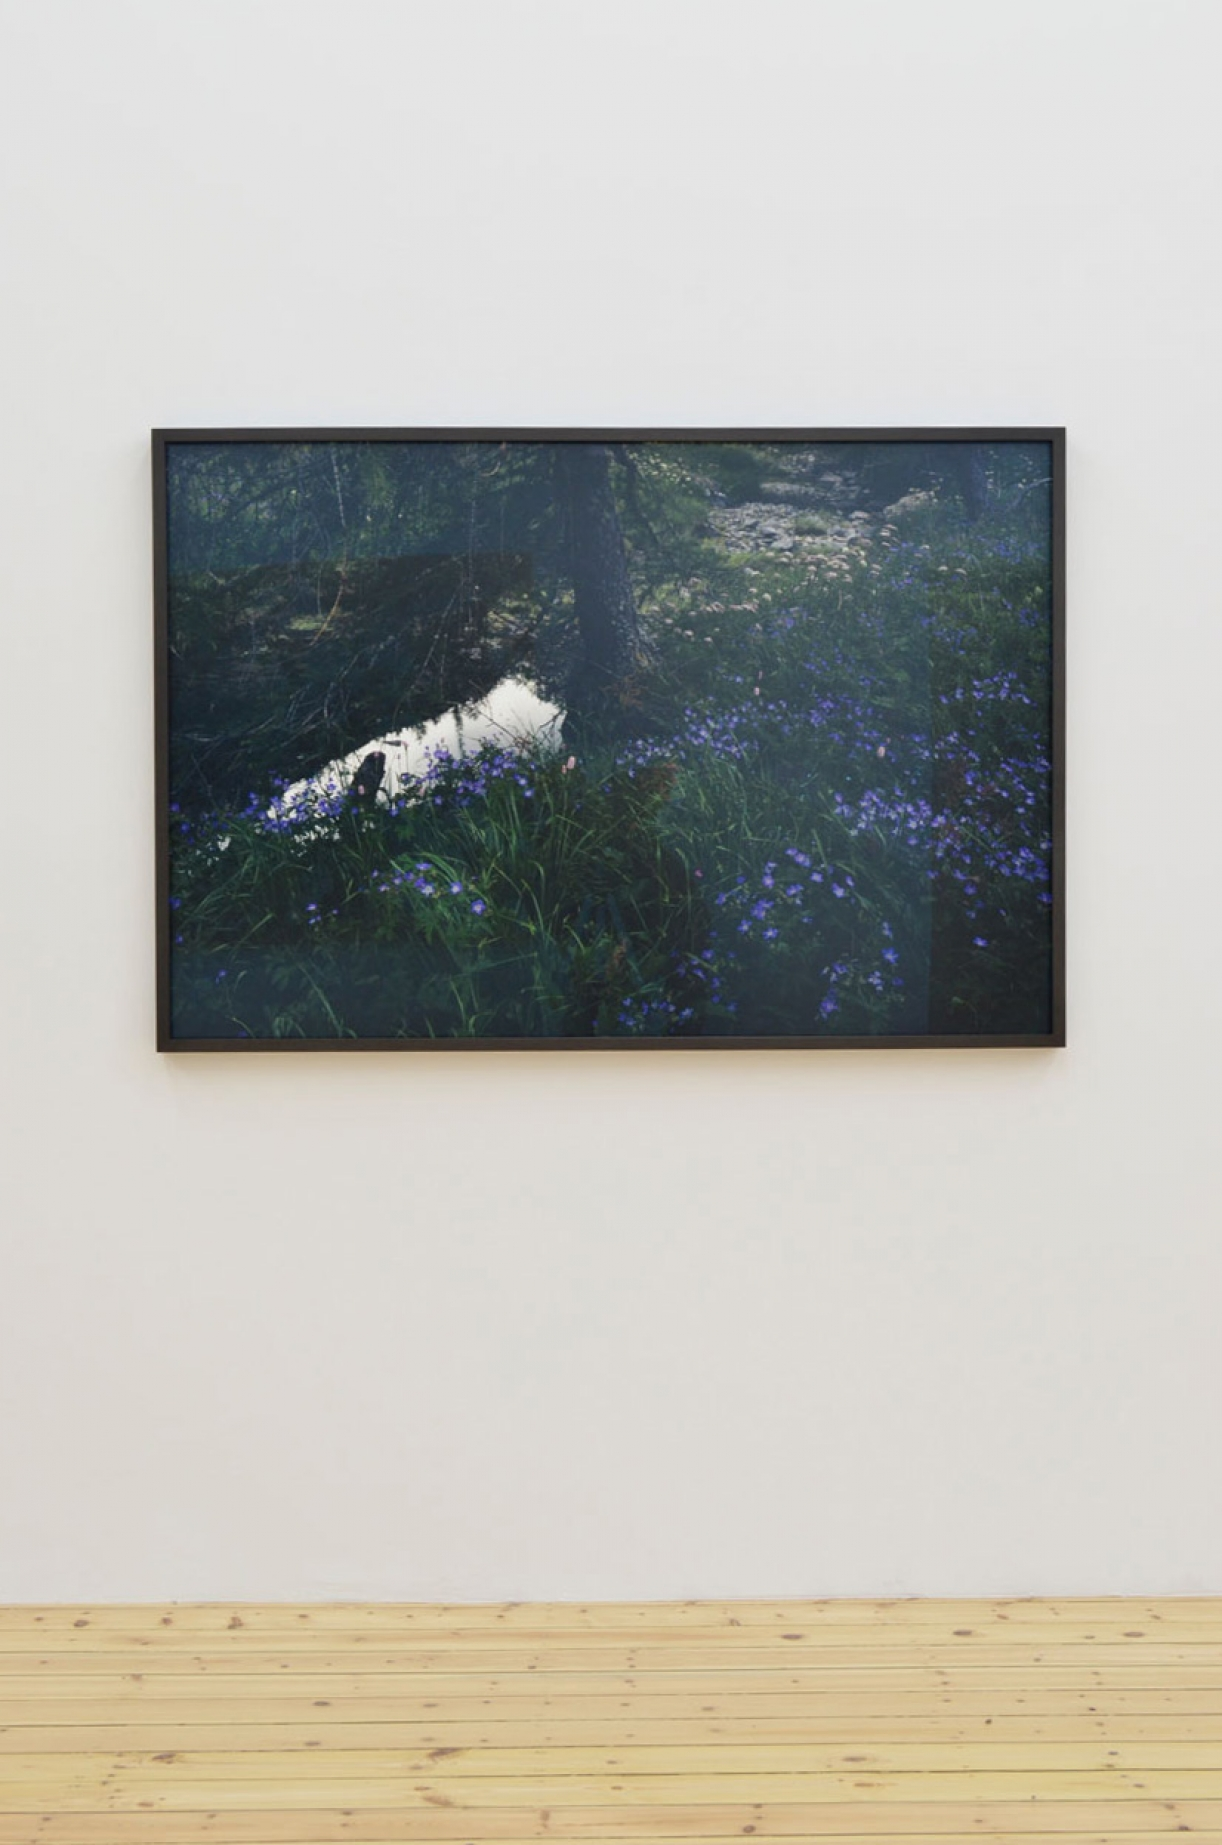 Balthasar Burkhard, Landscape, 2008, C-Print, 97 x 143,5 cm